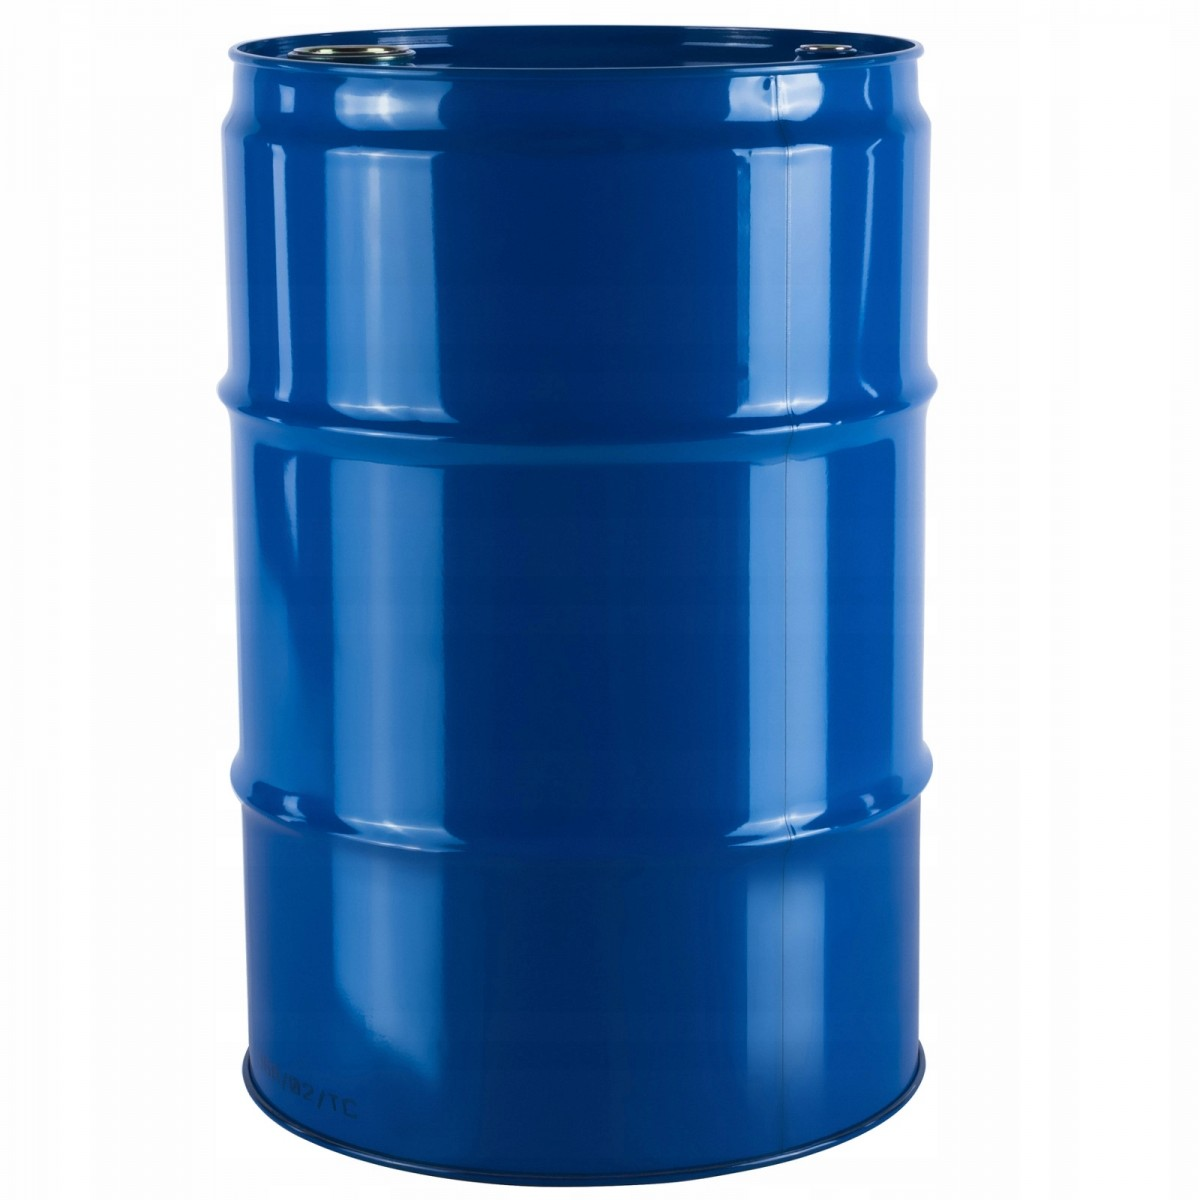 Изопропиловый спирт технический Марка С (ТУ 2421-556-05763441-2016) 216,5 литров